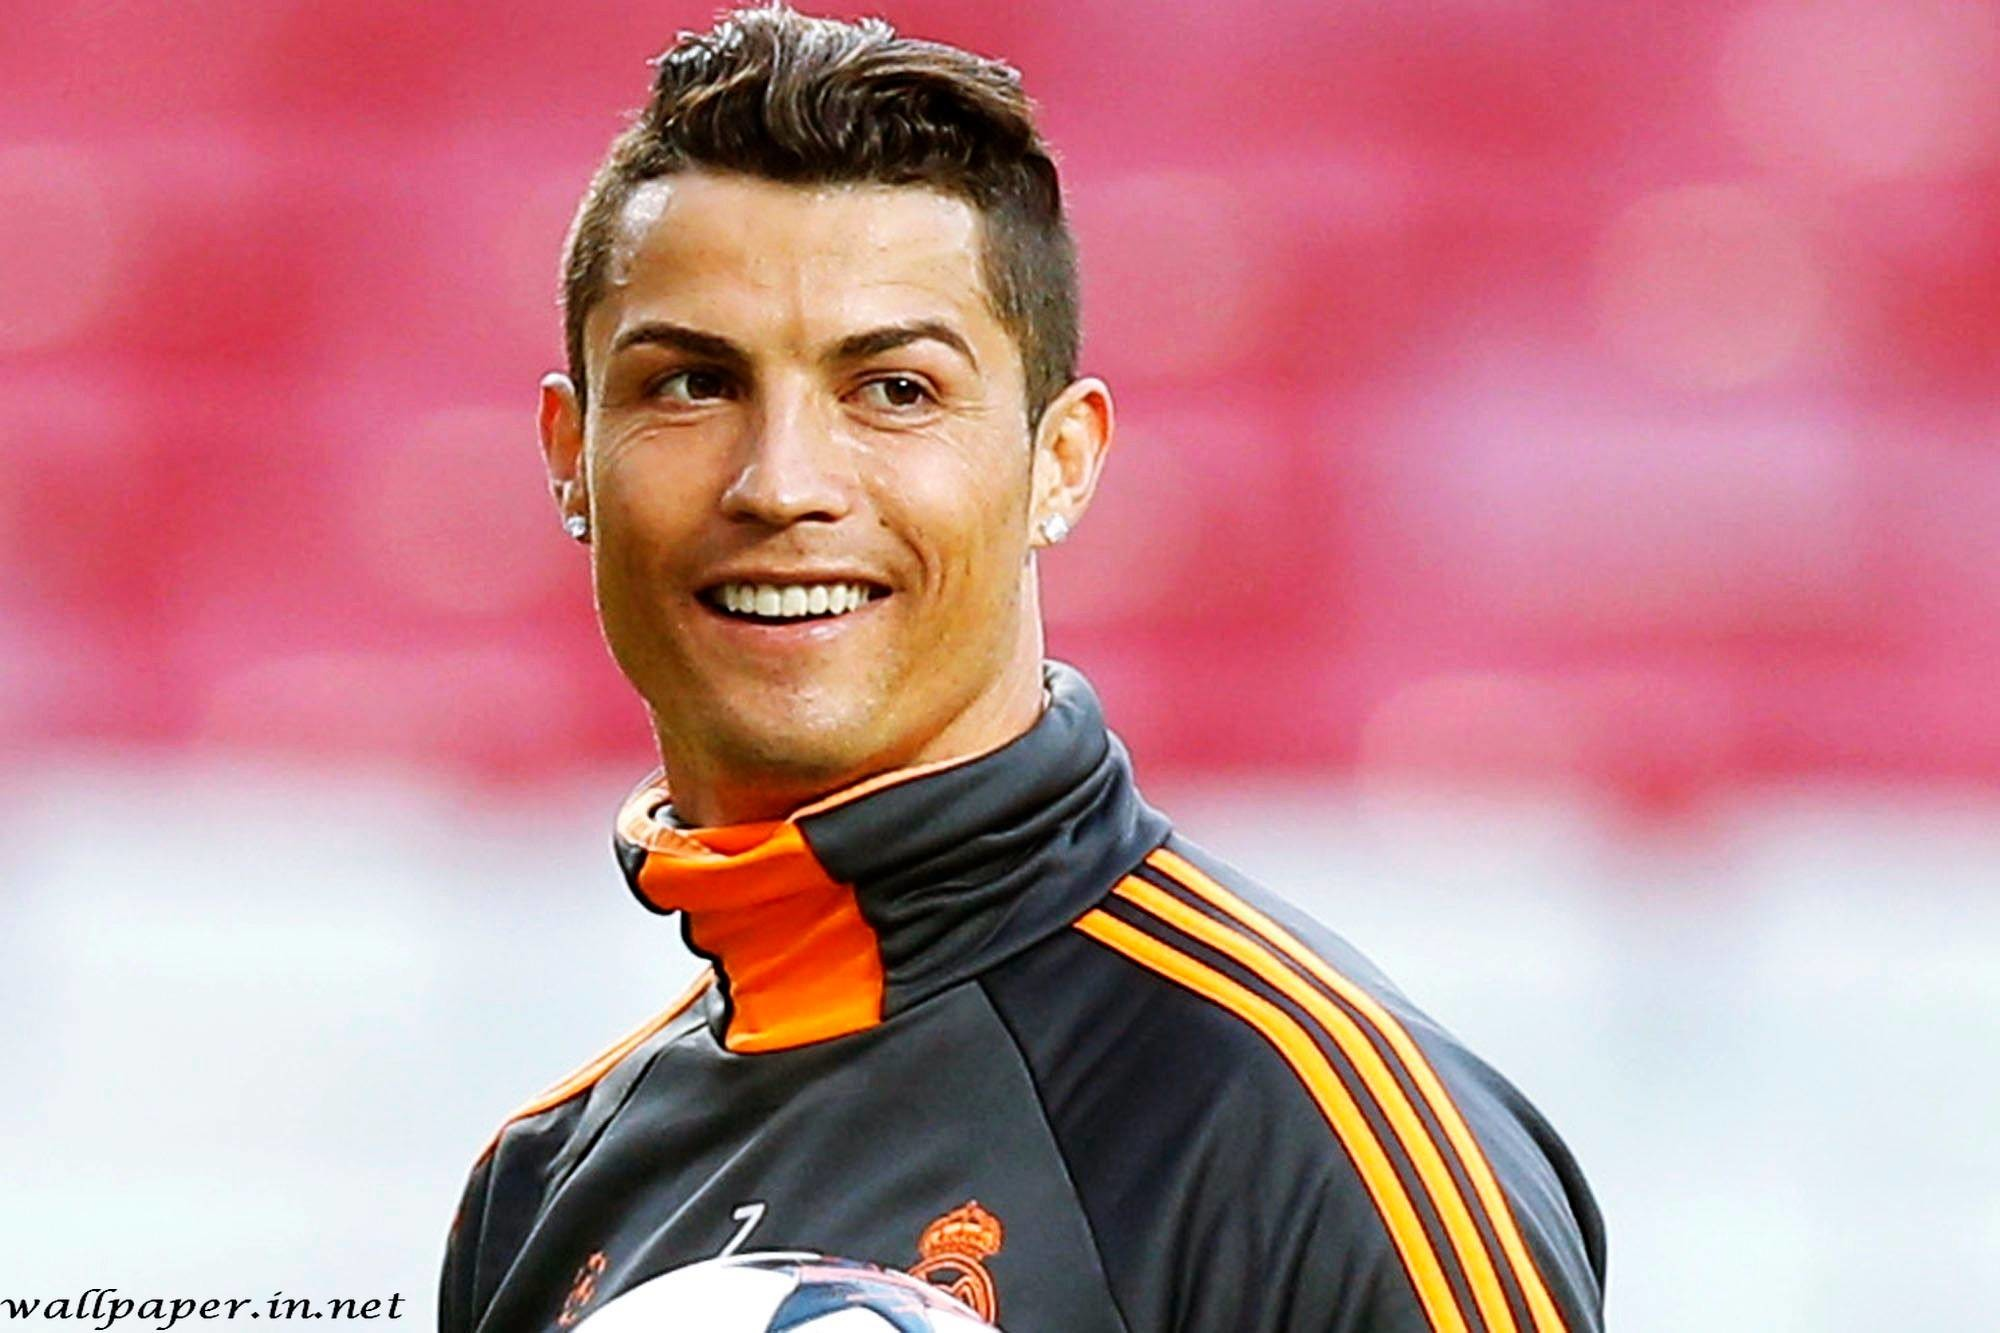 Cristiano-Ronaldo-HD-Wallpapers-Fifa-World-Cup-2014.